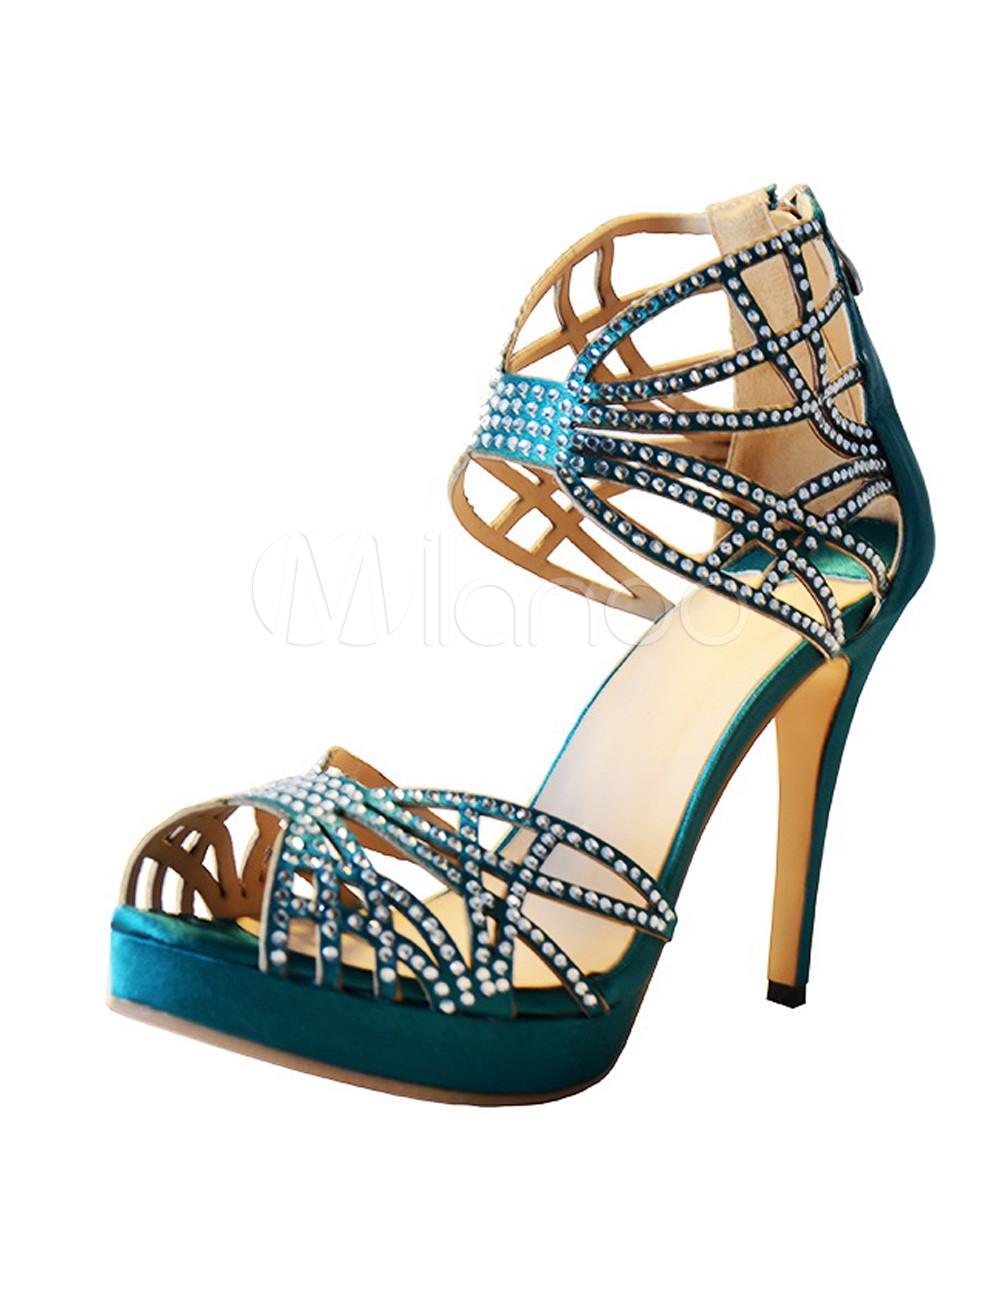 88fb2ca1610c03 Dark Green Silk And Satin Rhinestone Stiletto Heel Rubber Sole Dress Sandals  - Milanoo.com